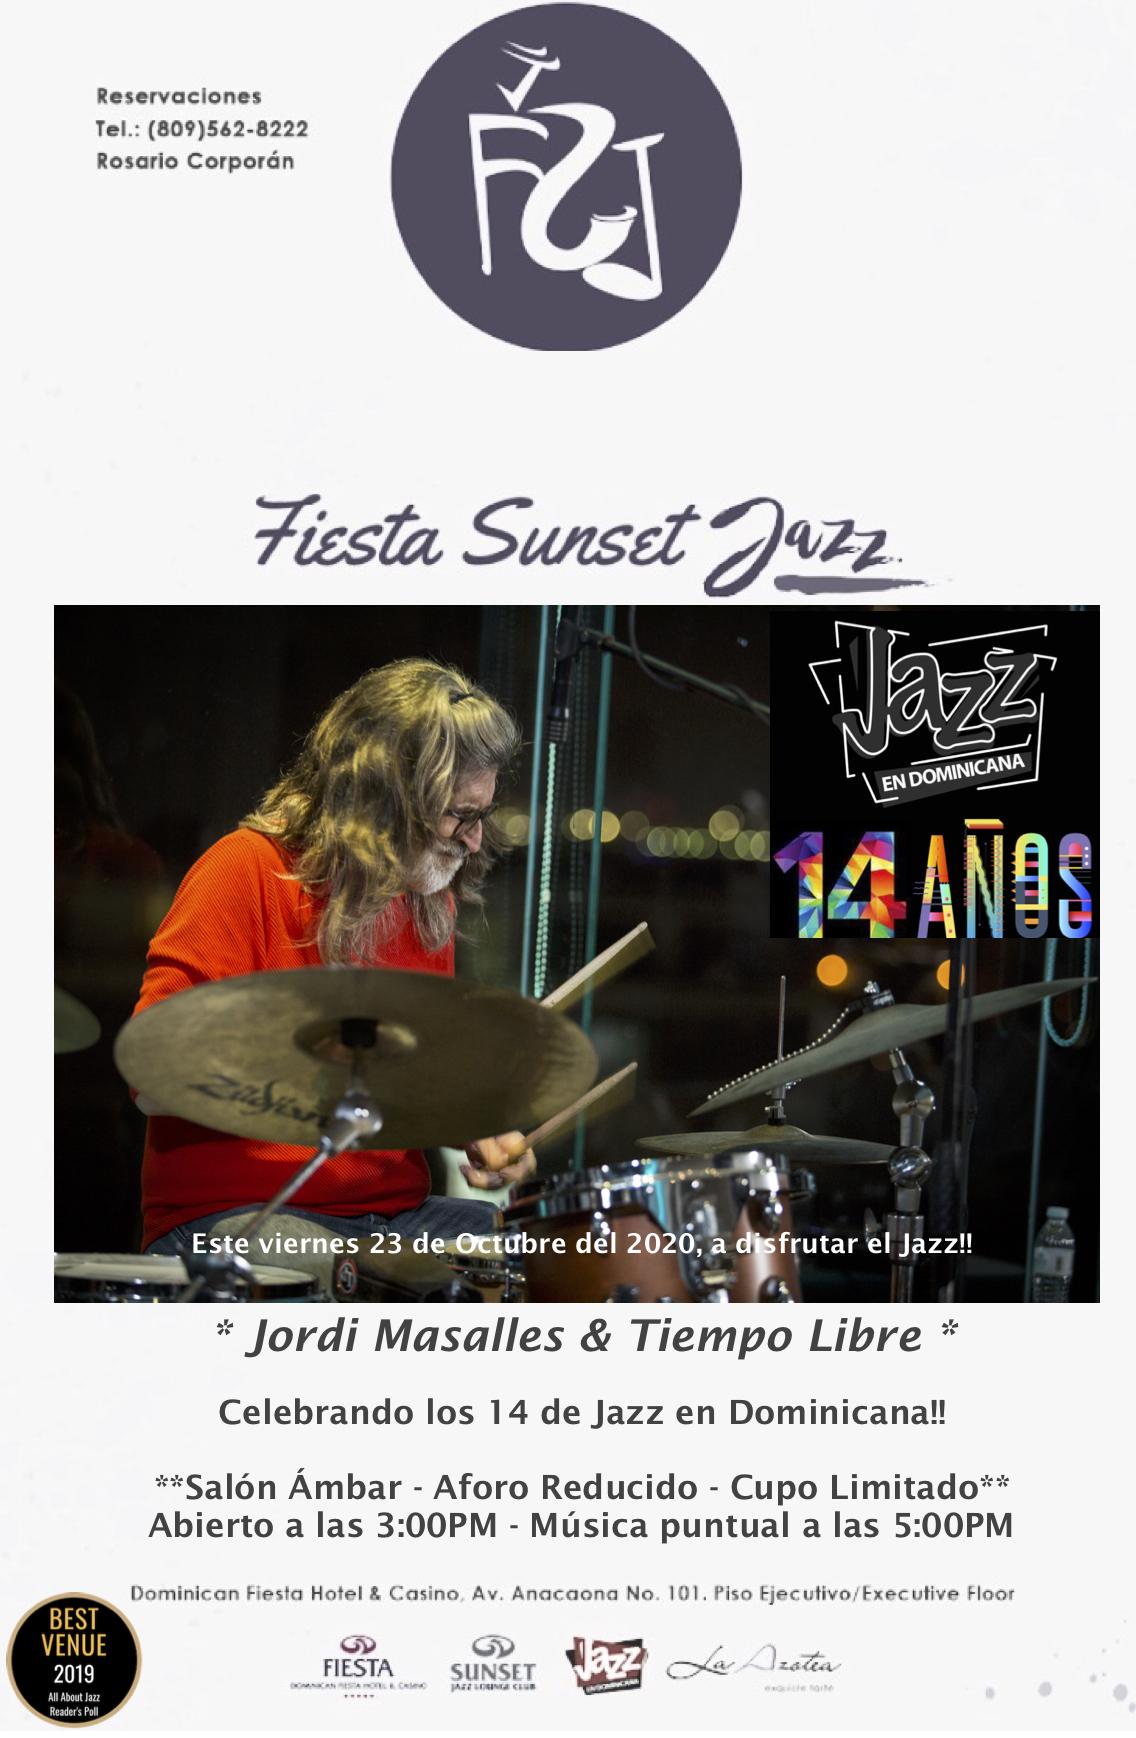 Jordi Masalles And Tiempo Libre Celebrate 14th Anniversary Of Jazz En Dominicana